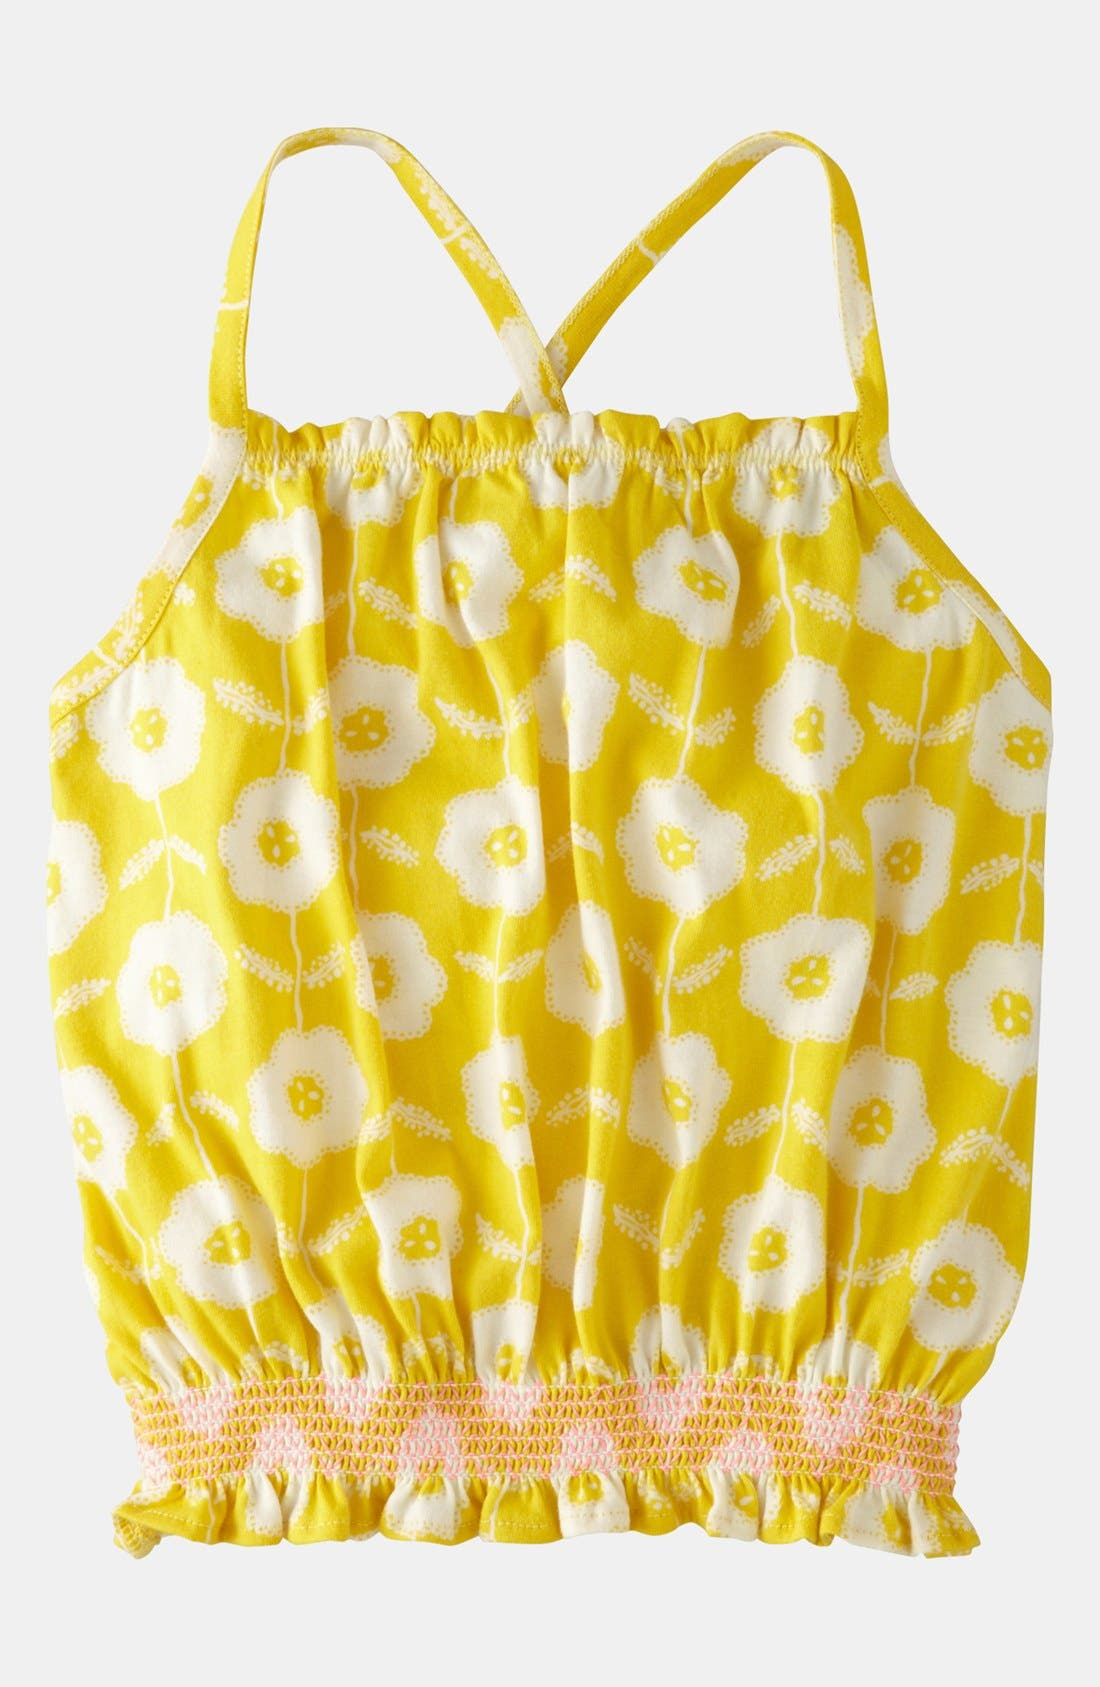 Alternate Image 1 Selected - Mini Boden 'Jersey Smocked' Top (Little Girls & Big Girls)